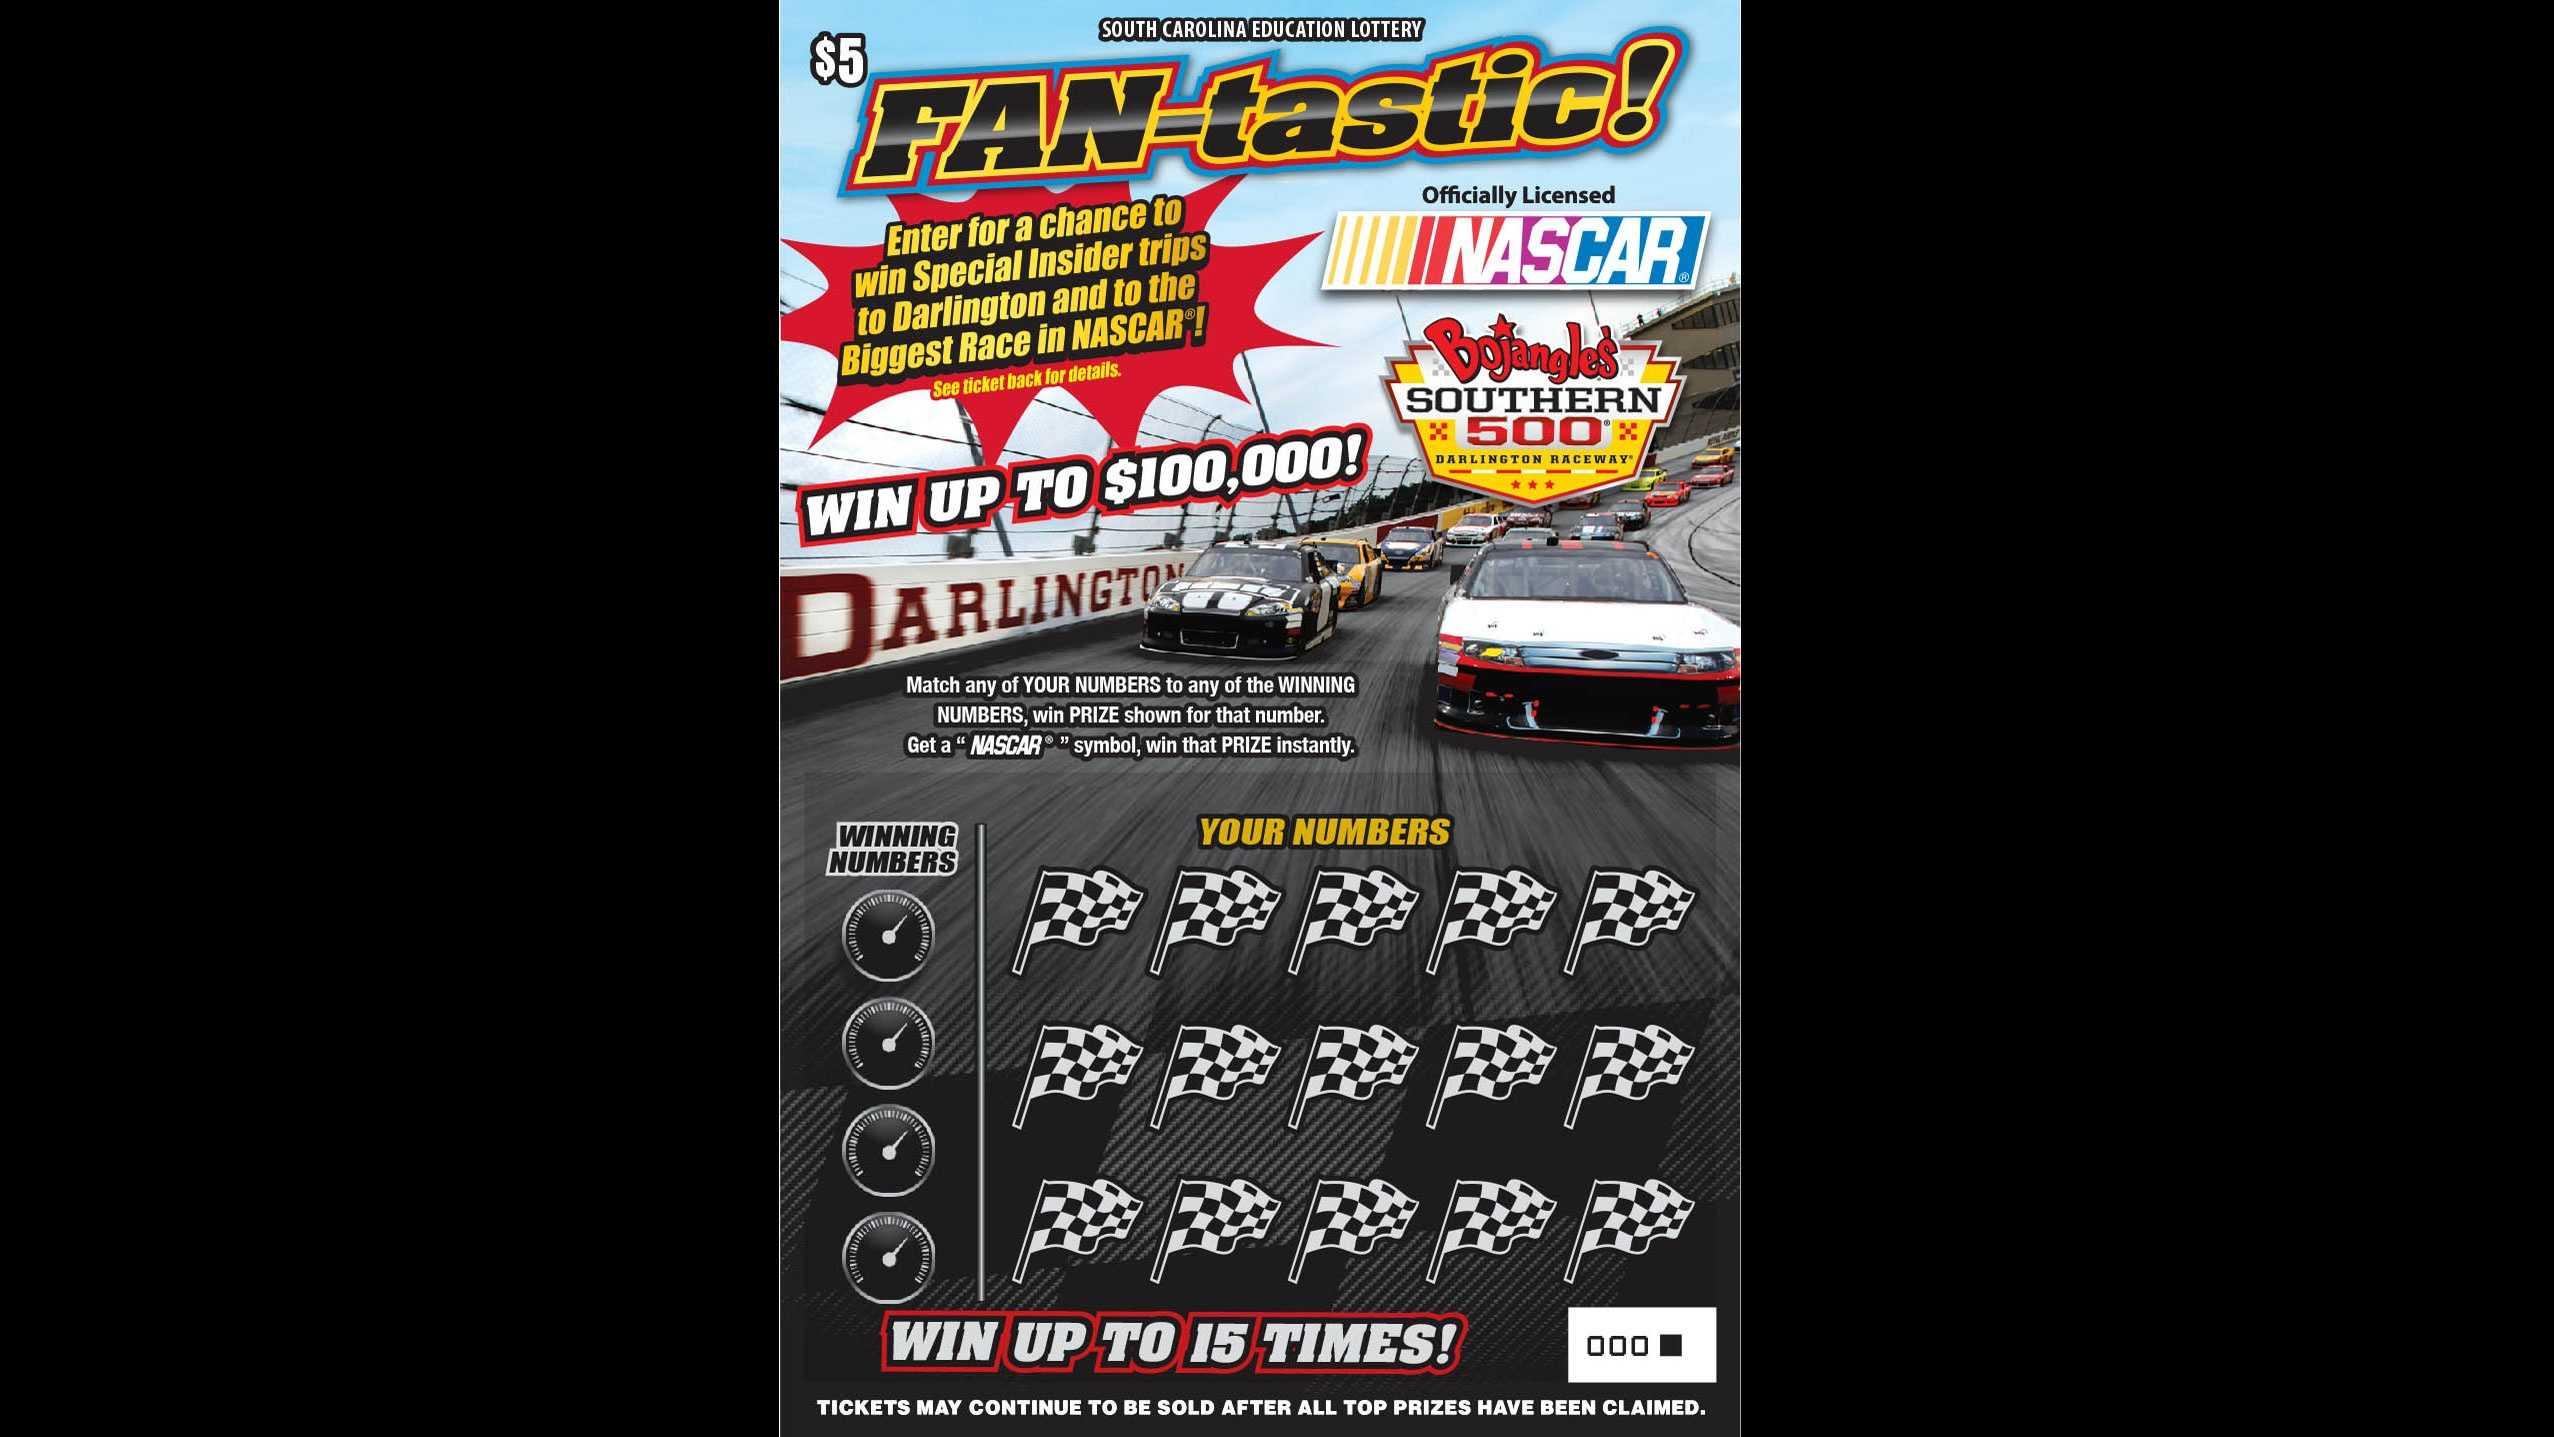 NASCAR lottery ticket